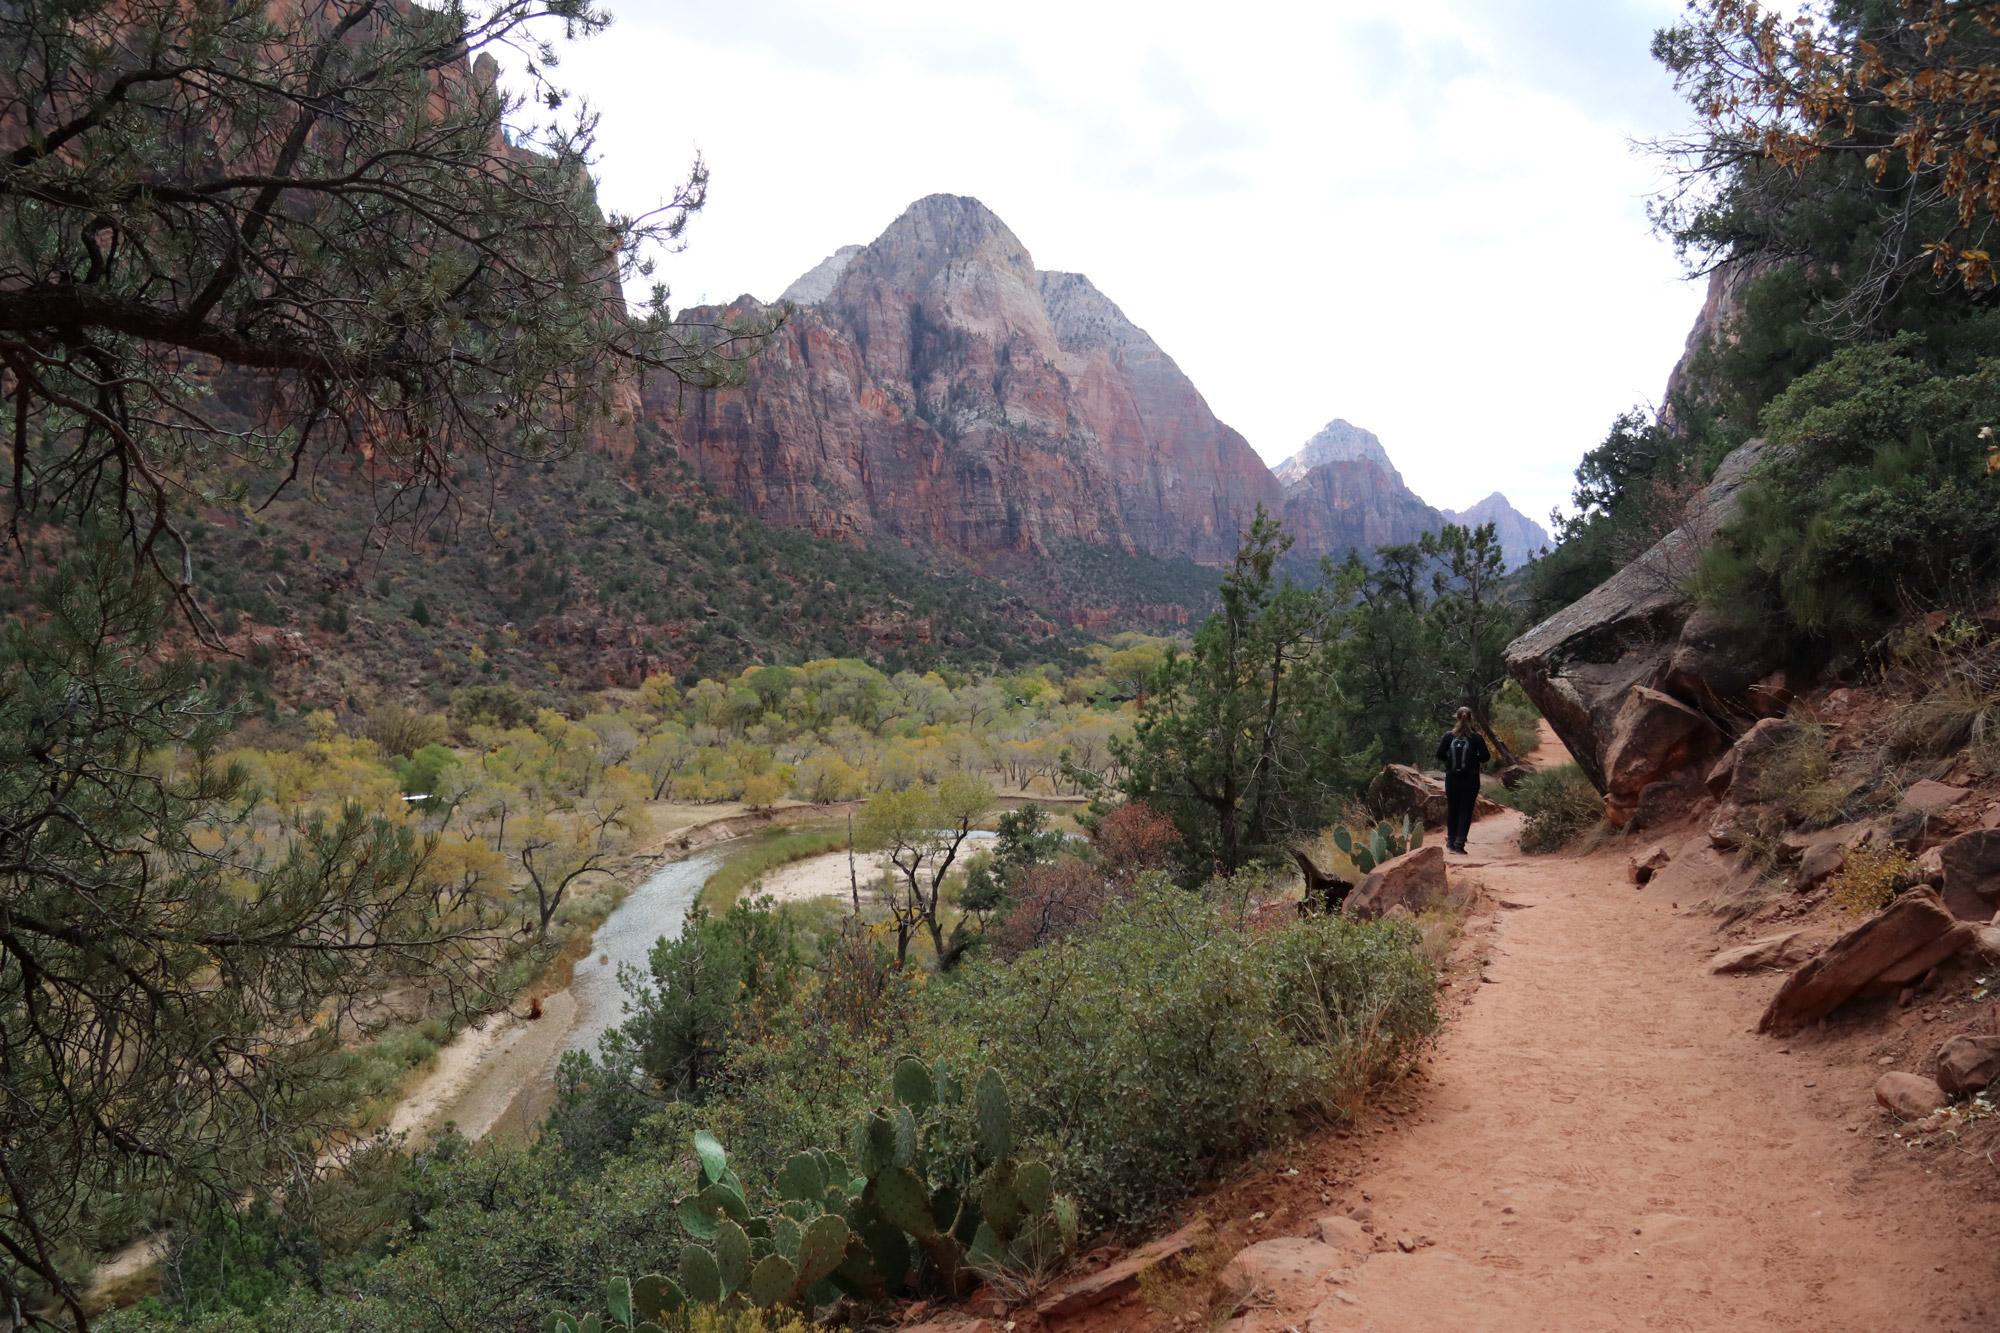 Amerika dag 16 - Zion National Park - Emerald Pools Trail